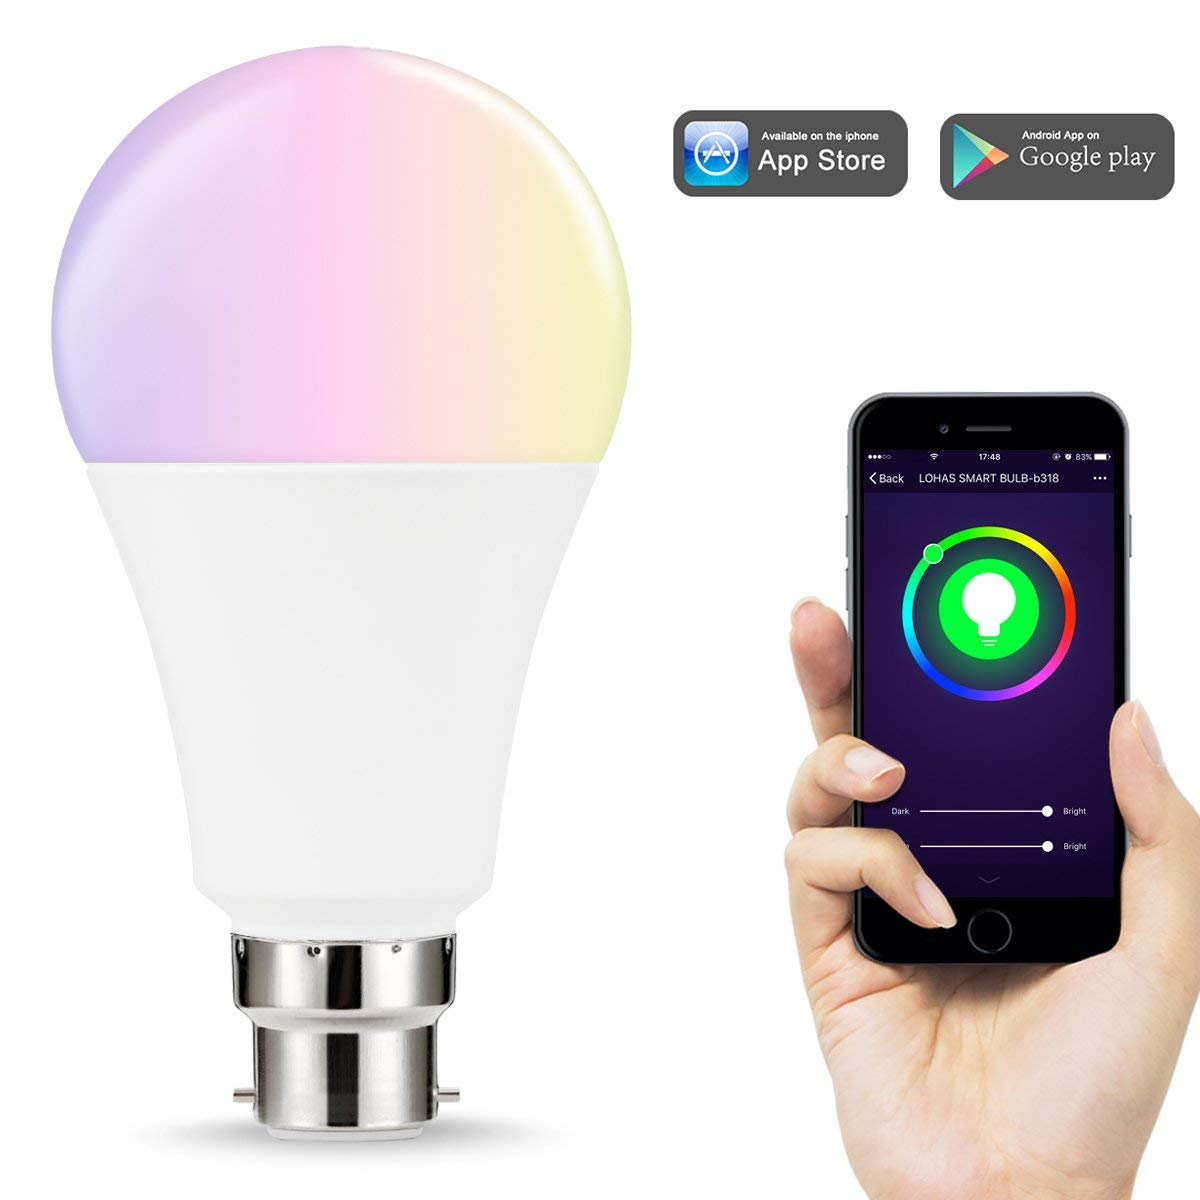 WiFi B22 Smart Light Bulbs 14W Equal to 100W LED Bulb RGB+Cool White Colour Changing Mood LightWorks with Alexa and Google Home